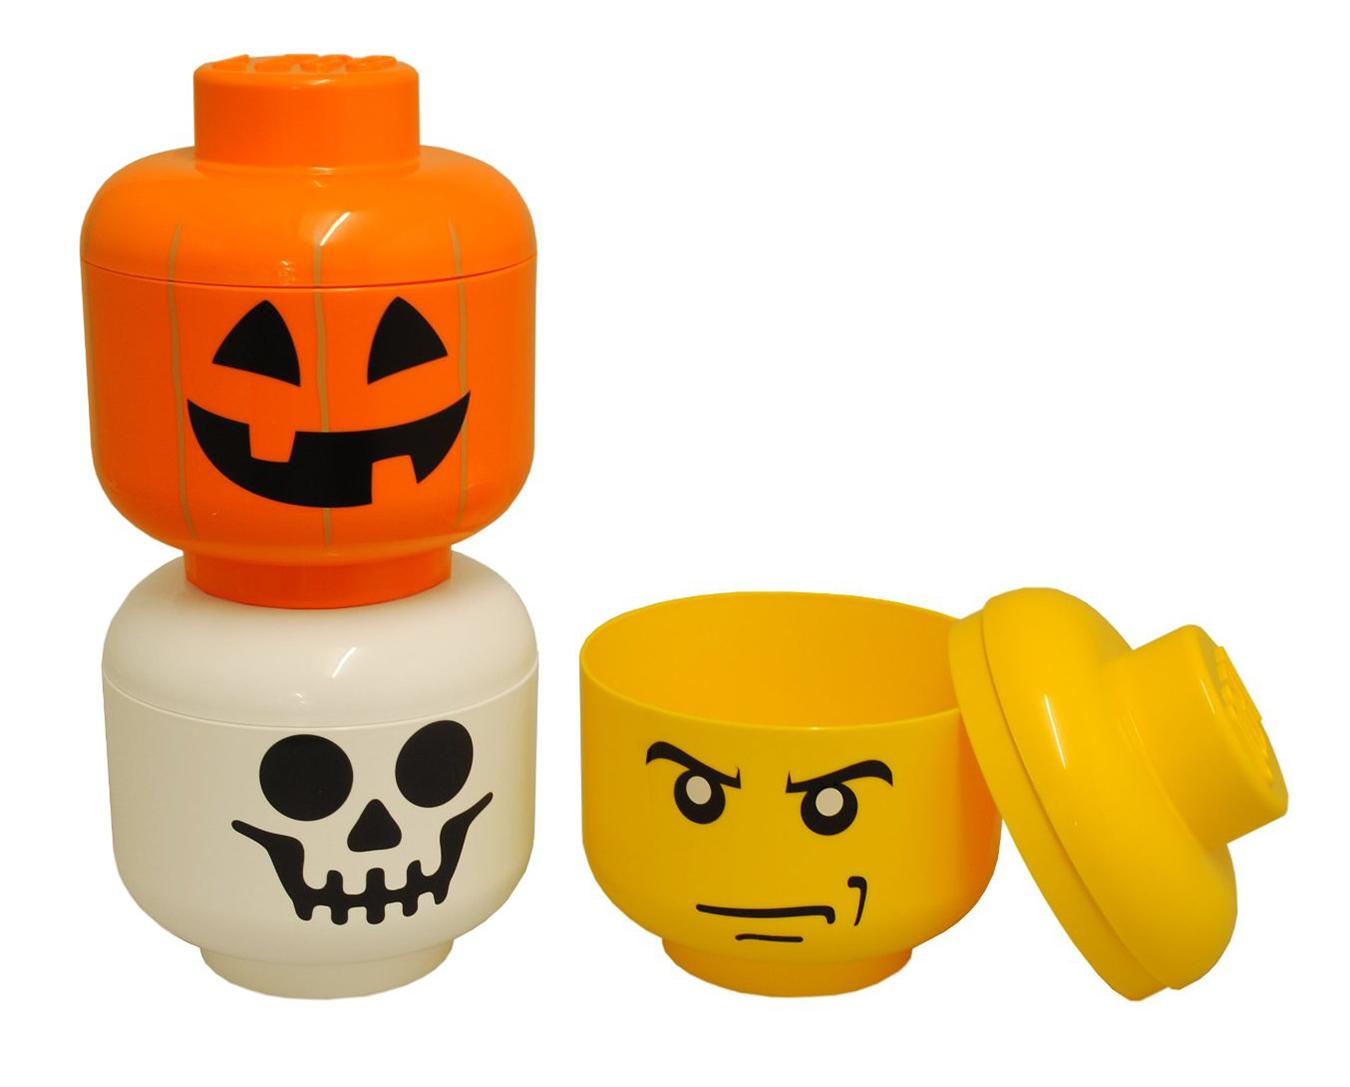 Lego rangement 40310108 pas cher t te de rangement lego - Boite rangement lego pas cher ...